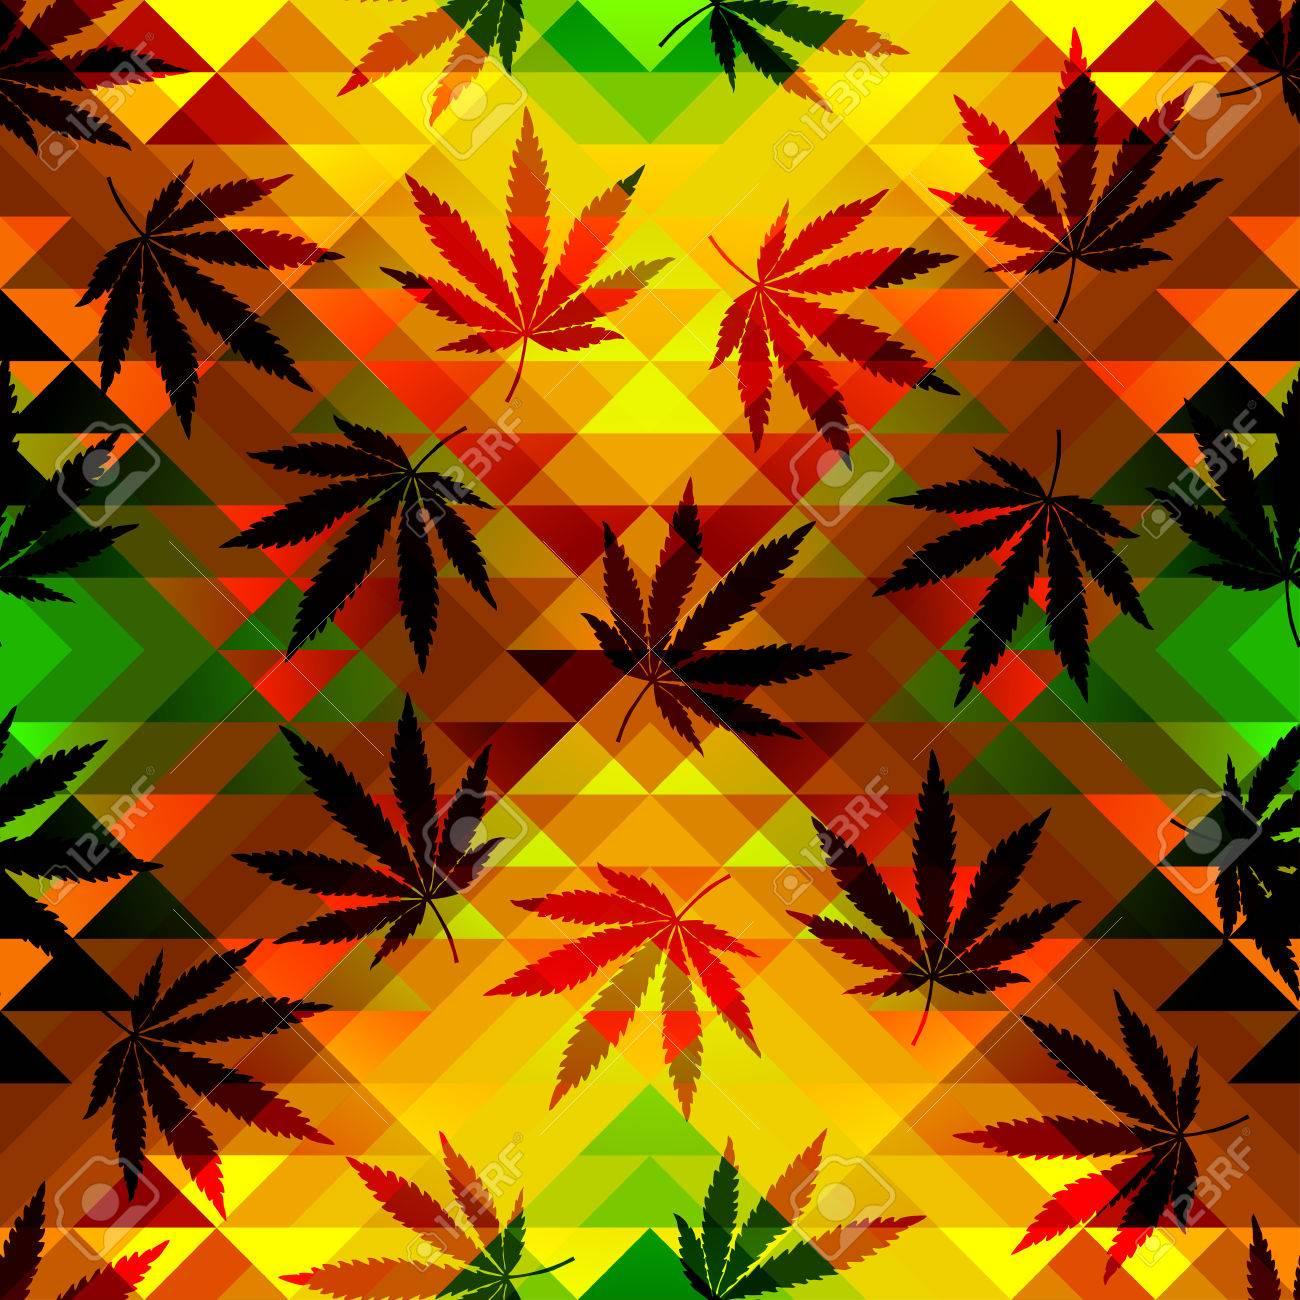 Seamless pattern of the hemp leaves on geometric background. - 44411113